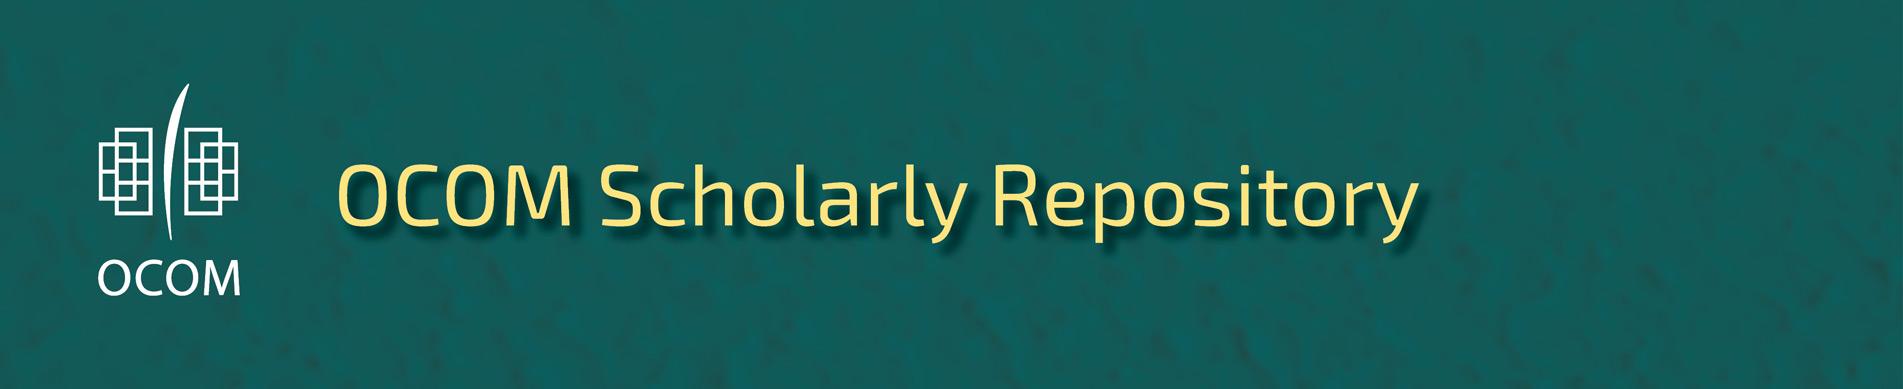 OCOM Scholarly Repository